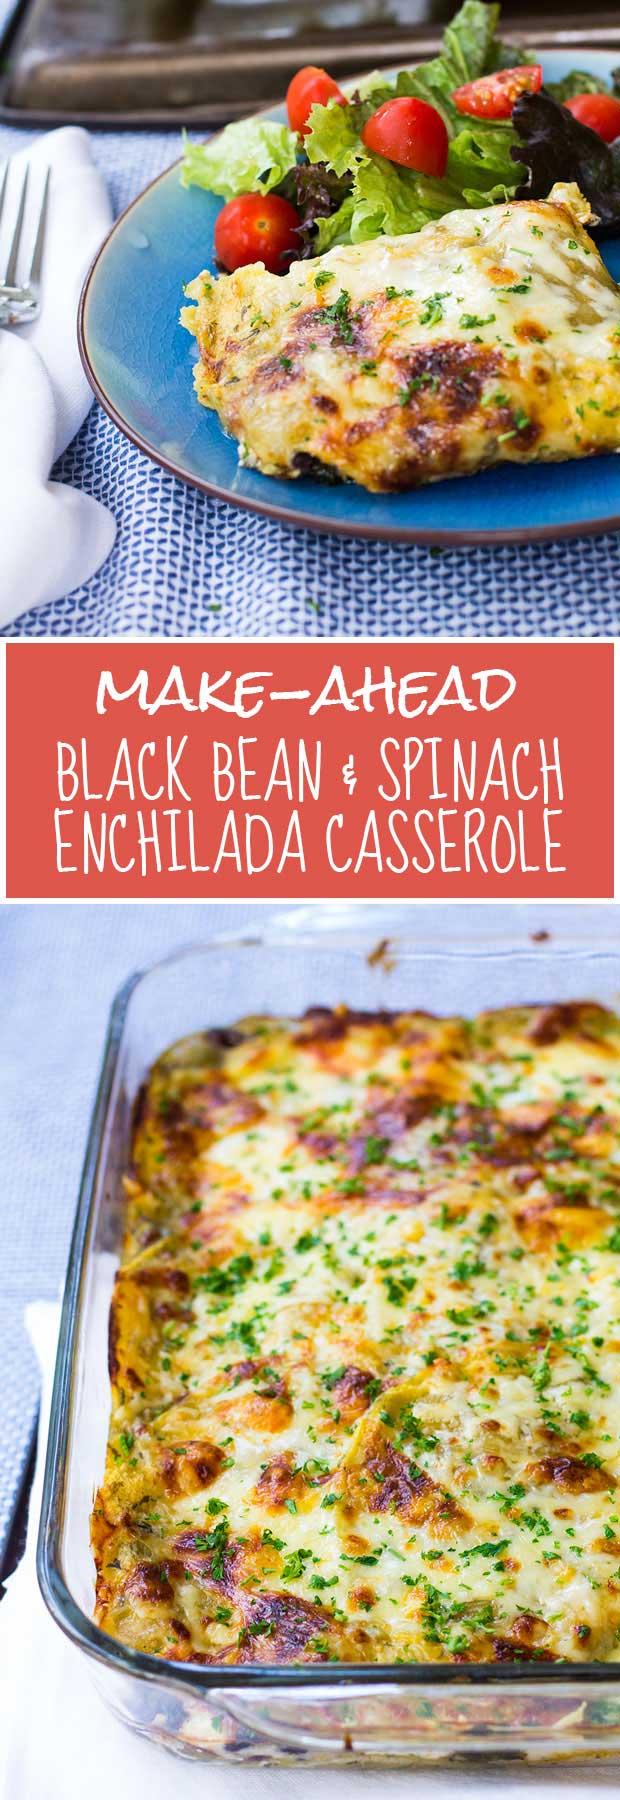 Make-Ahead Black Bean & Enchilada Casserole — an easy, gluten-free, healthy, kid-friendly make-ahead meal! | www.kiwiandbean.com